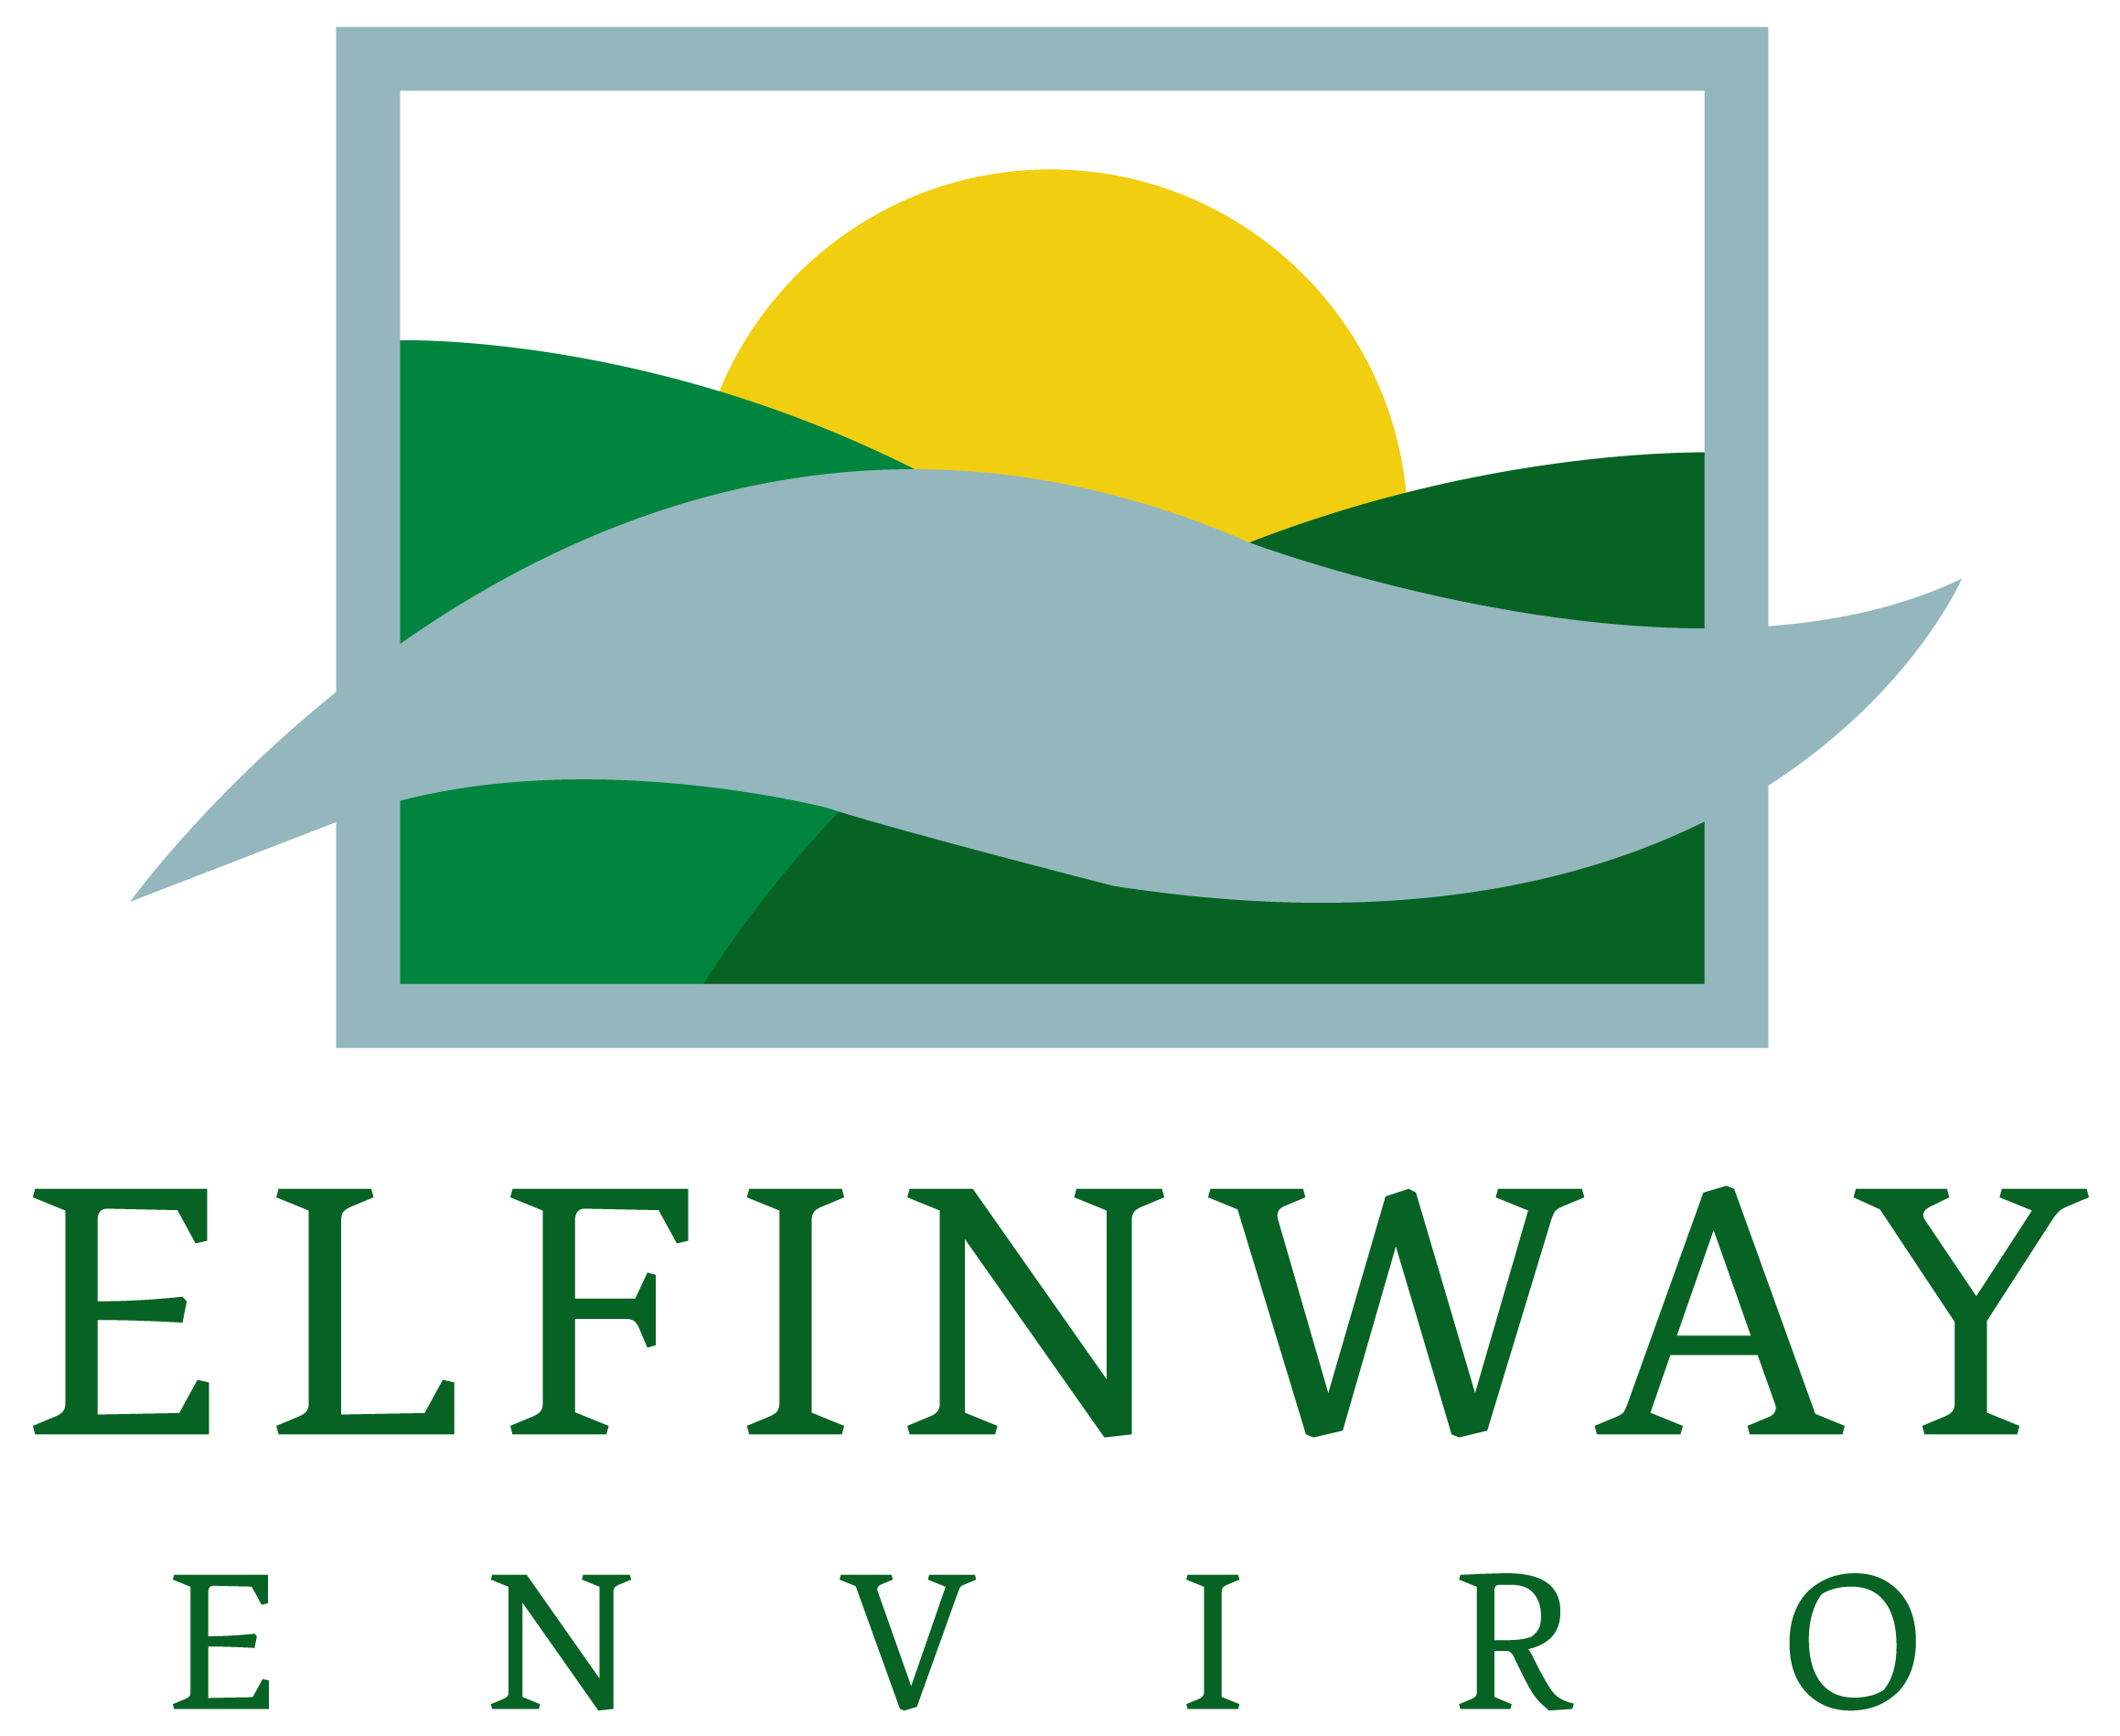 Hoppel Design logo for Elfinway